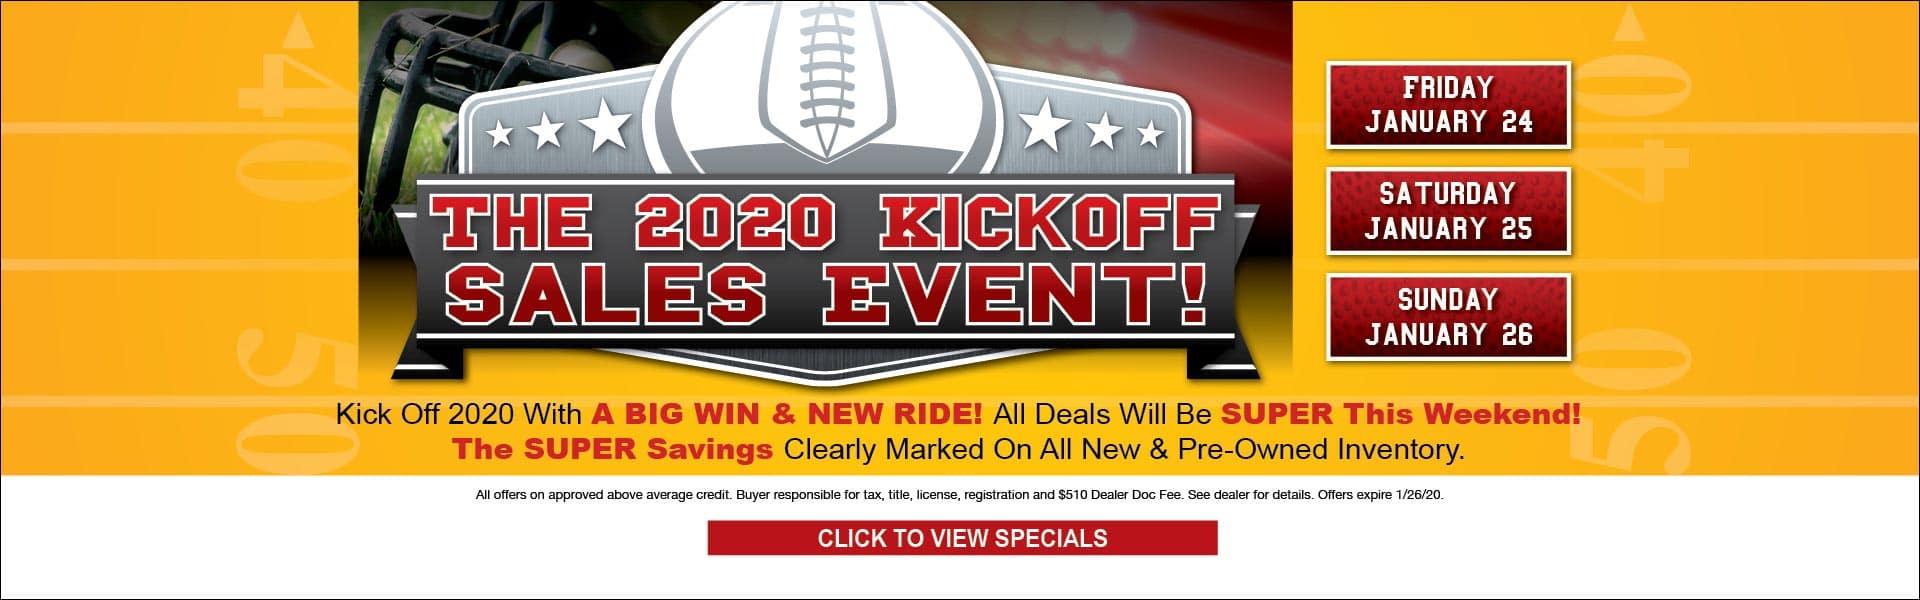 Sales Event - 2020 Kick off